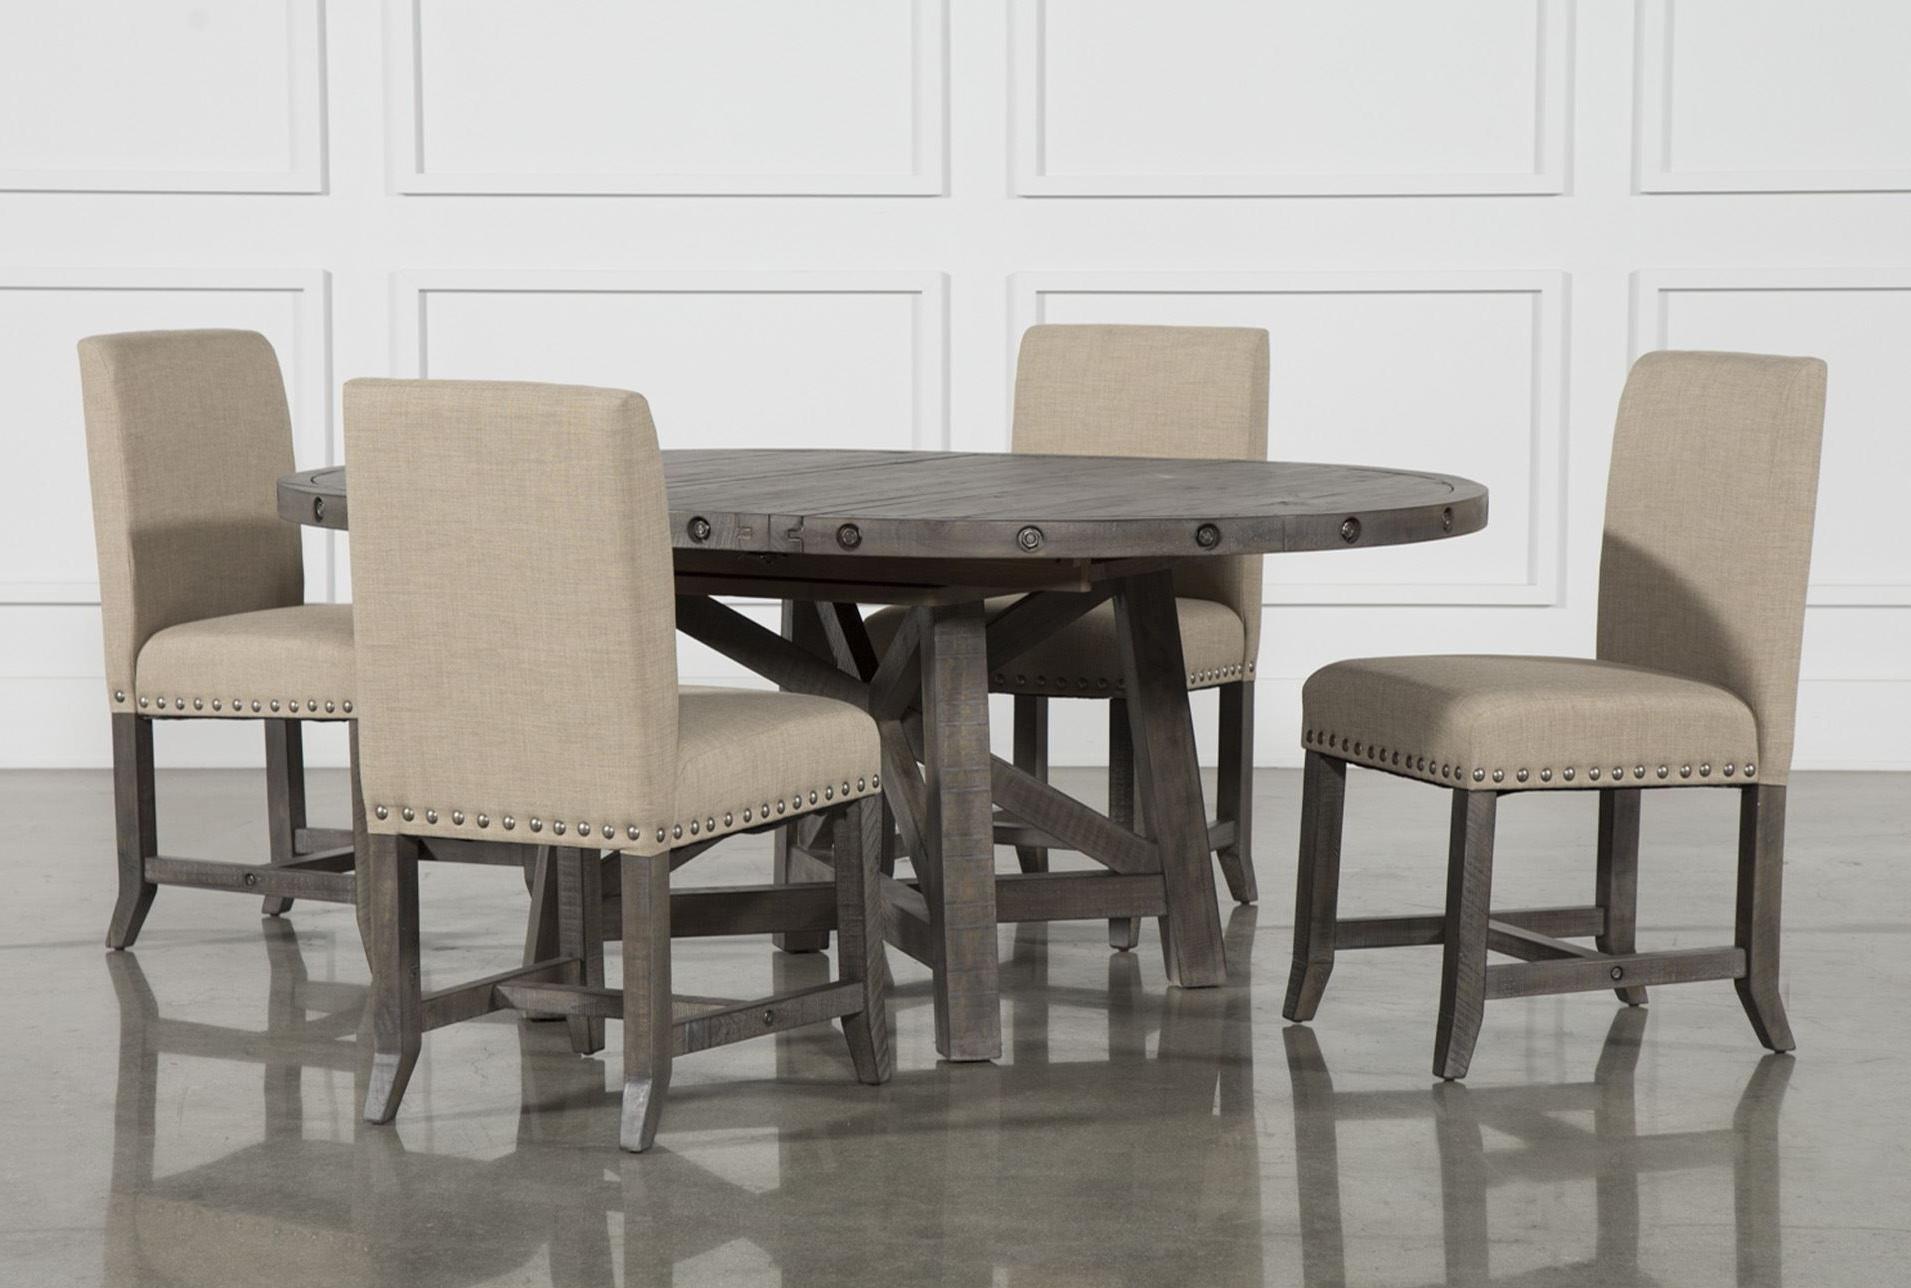 Jaxon Grey 5 Piece Round Extension Dining Set W/upholstered Chairs regarding 2017 Caden 5 Piece Round Dining Sets